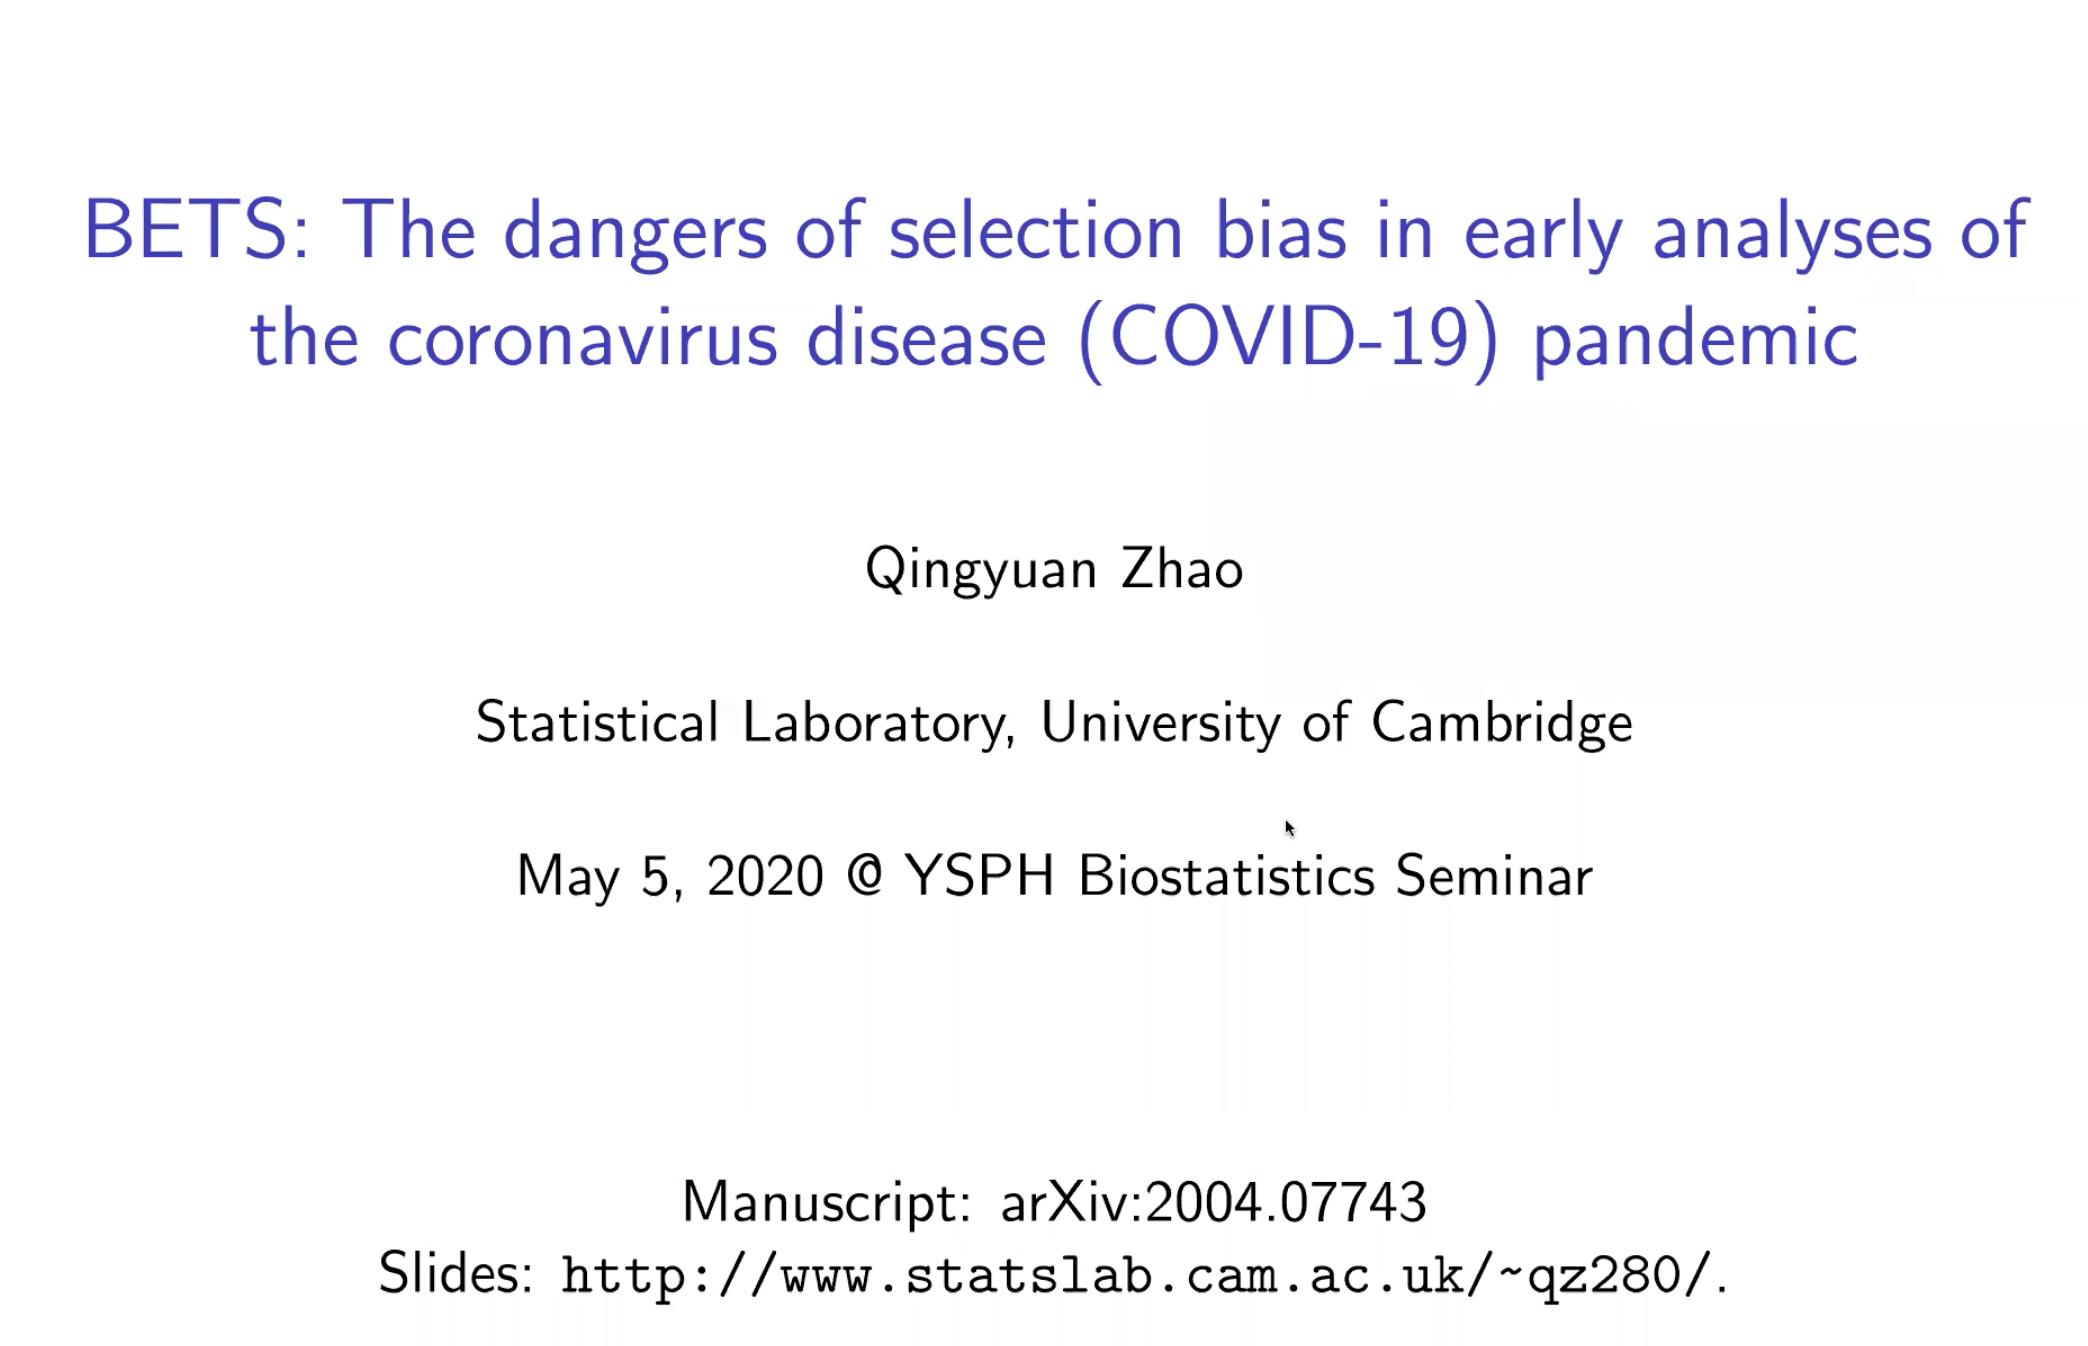 Biostatistics Seminar: BETS: The dangers of selection bias in early analyses of the coronavirus disease (COVID-19) pandemic